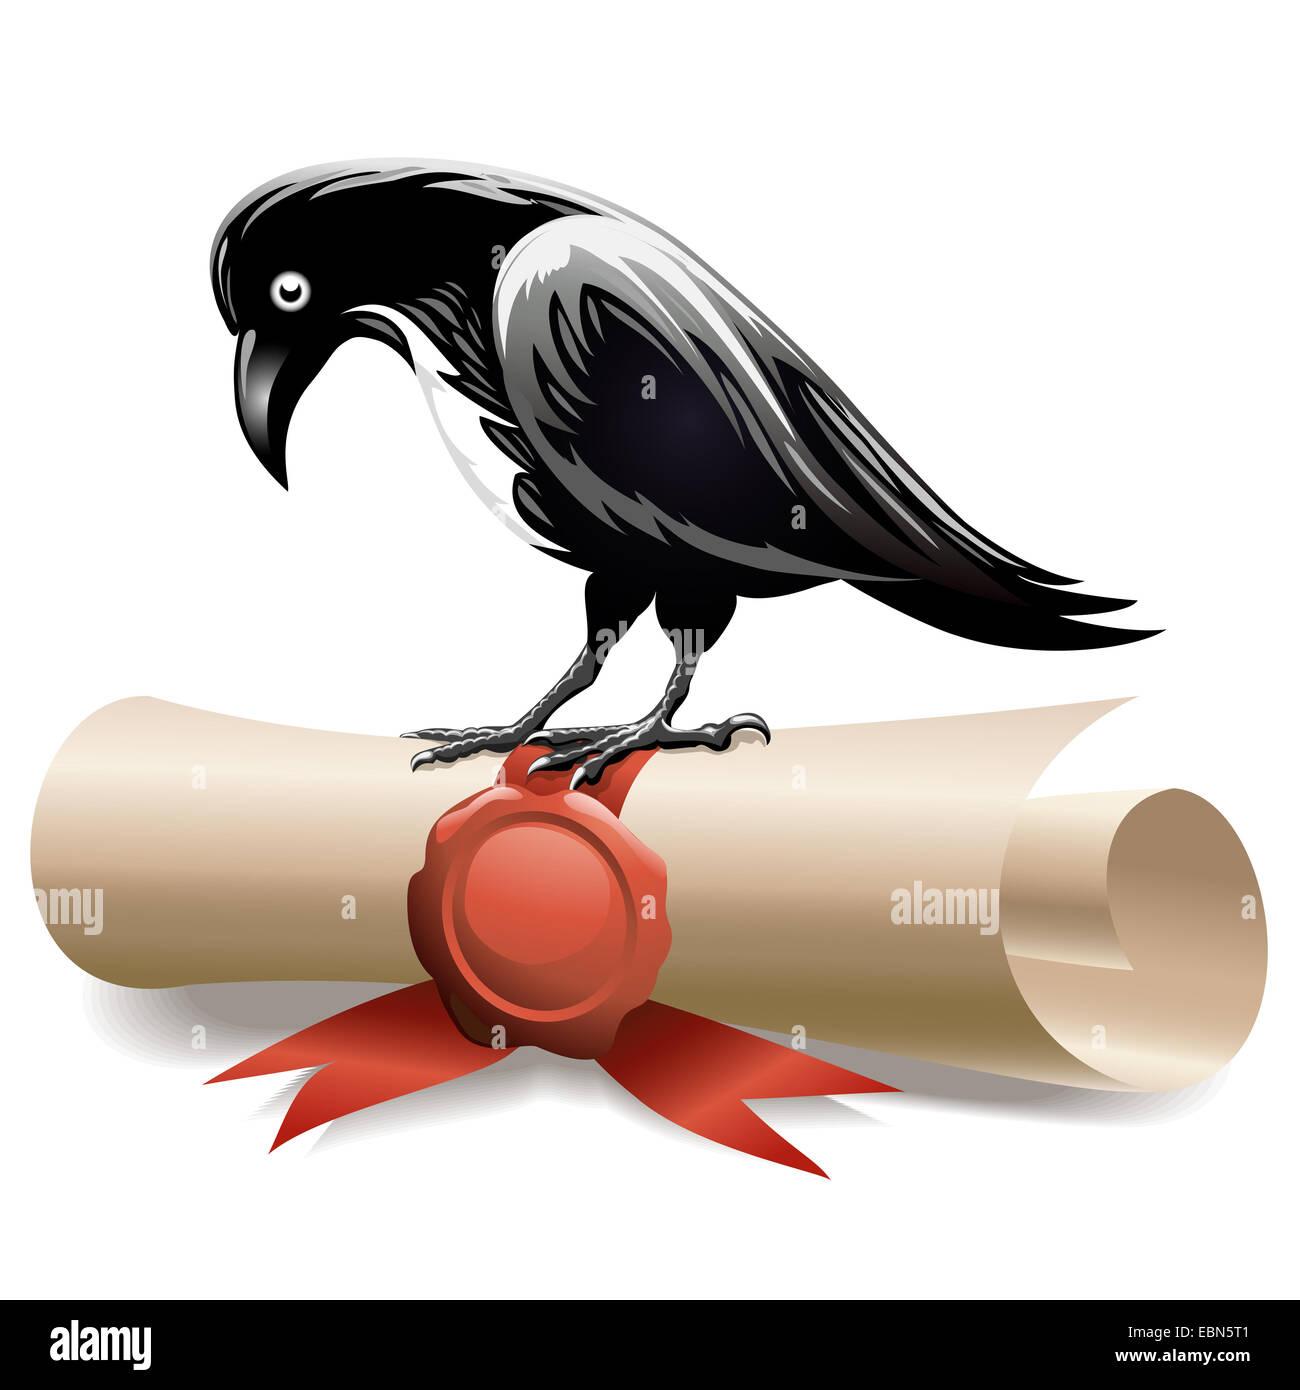 Black raven and diploma - Stock Image